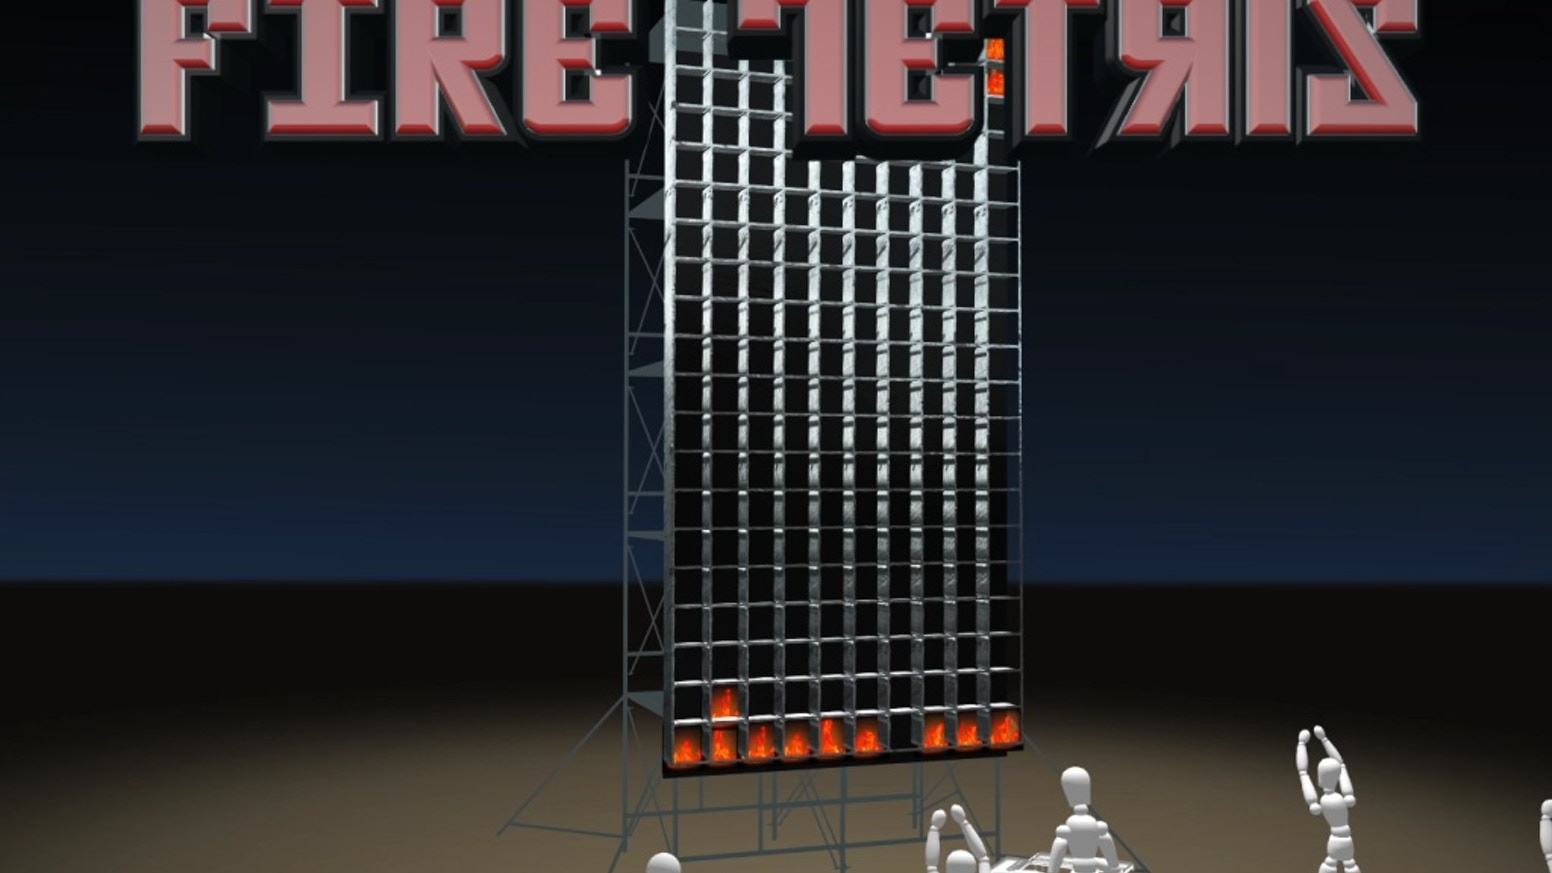 An epic fire art installation going to Burning Man. Support Fire Tetris! It's Tetris except on fire. http://miaoulabs.com/